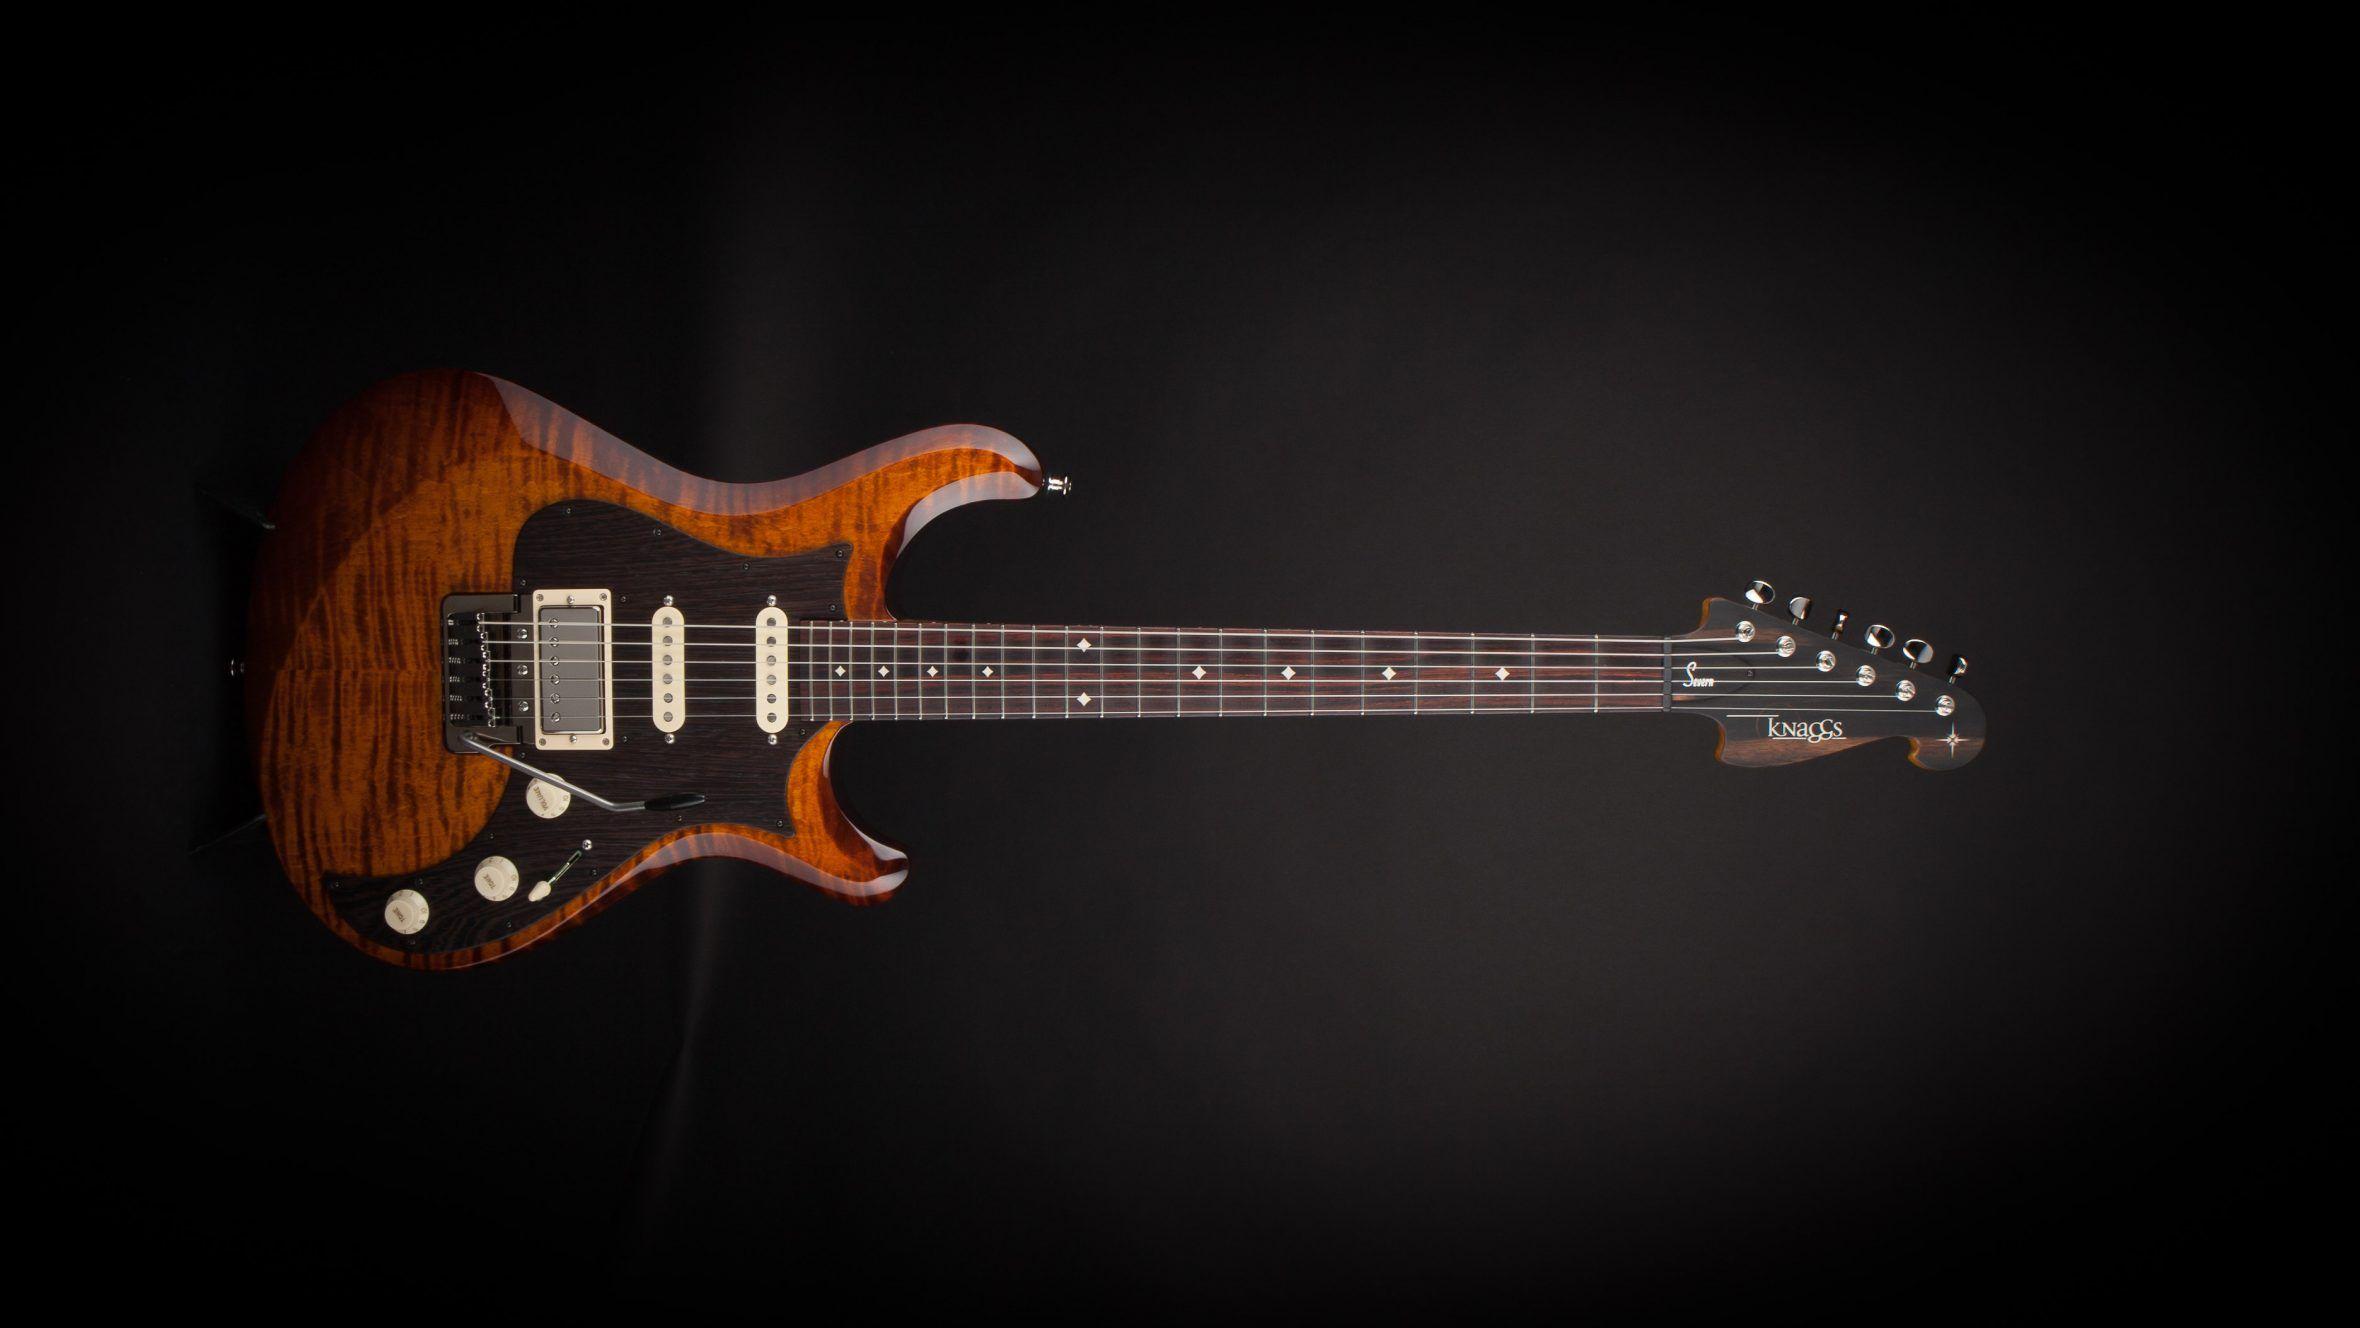 Knaggs Guitars Chesapeake Severn Aged Scotch Tier 2 #694